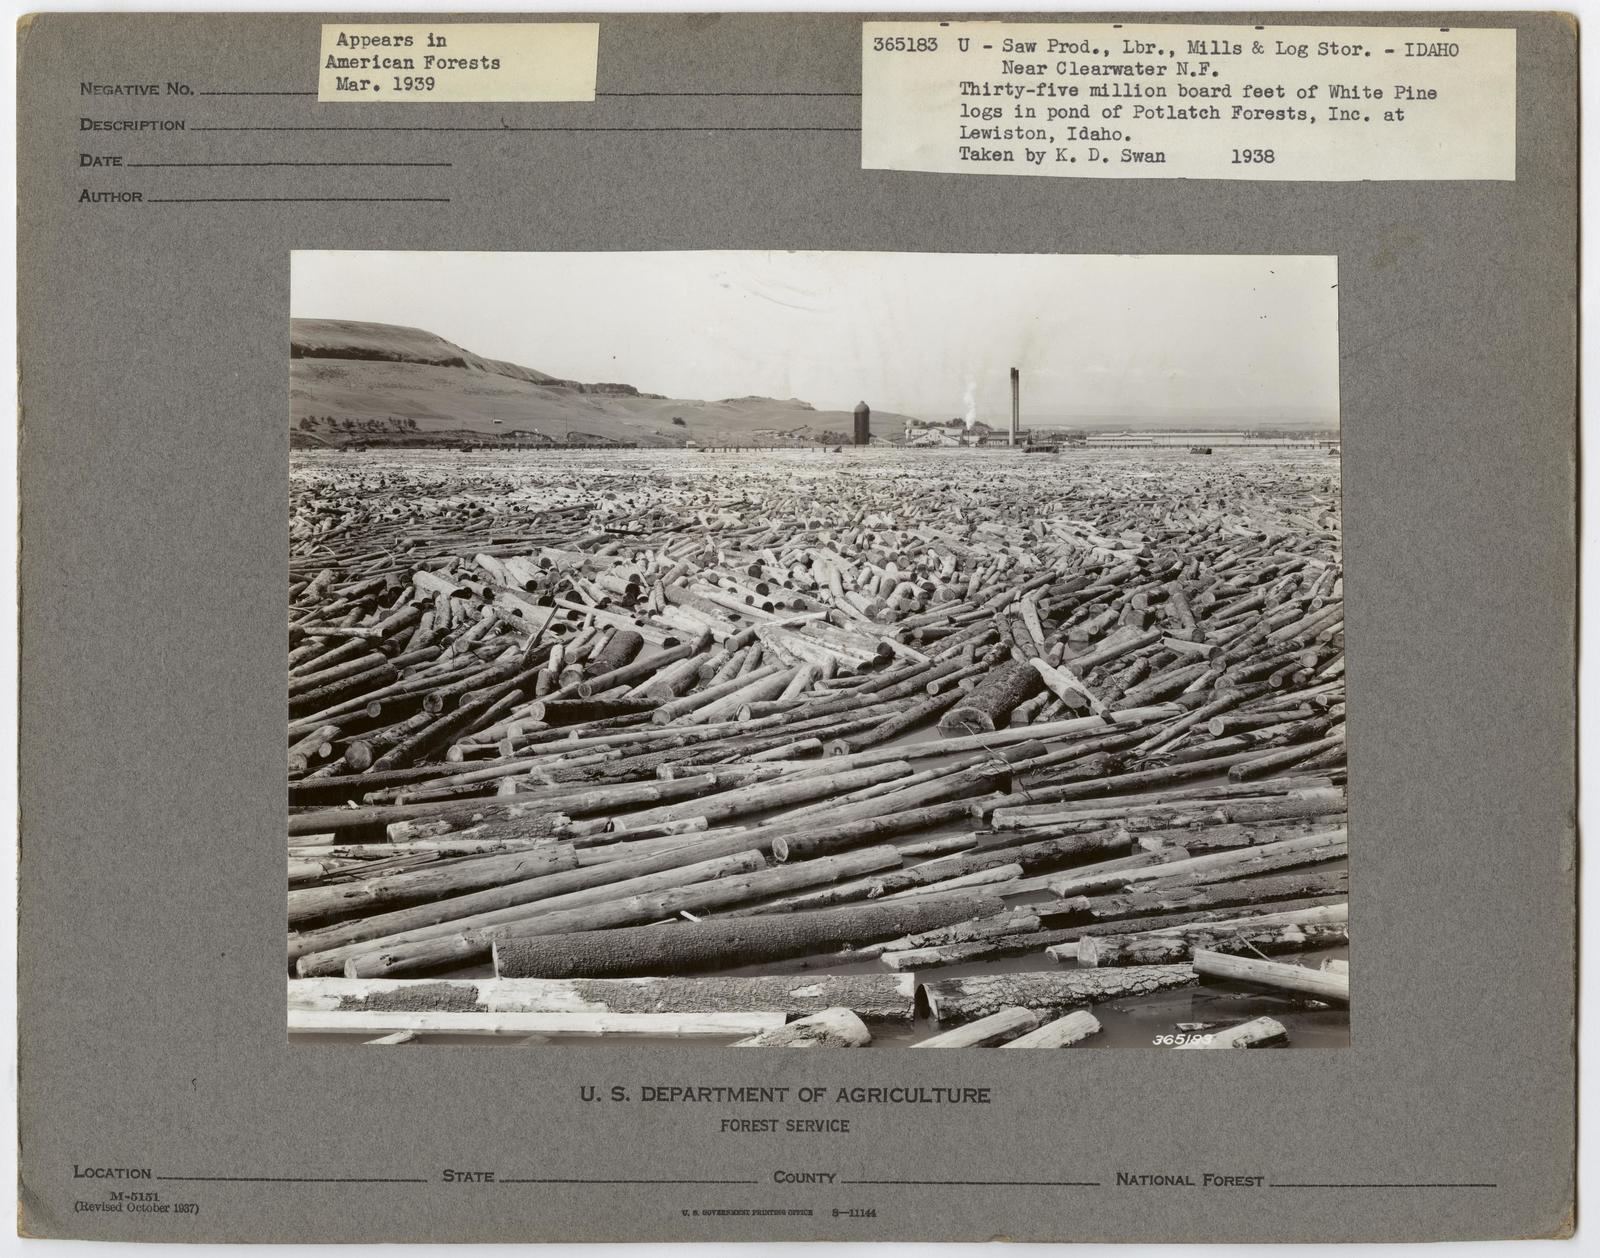 Mills, Milling and Log Storage - Idaho